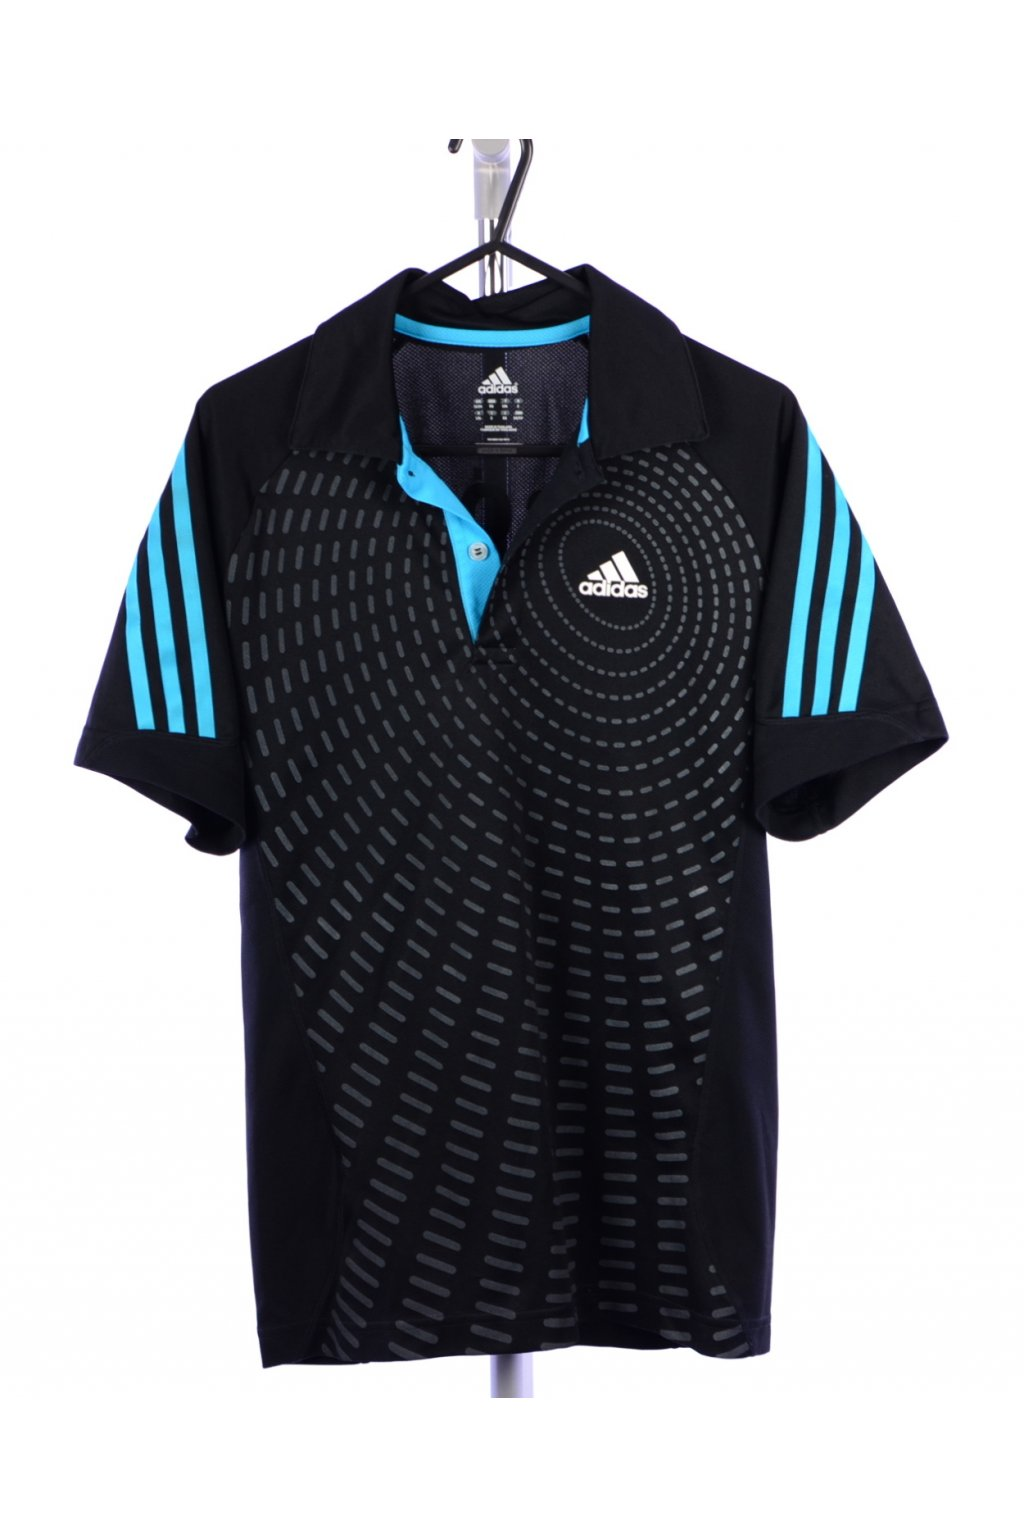 Tričko Adidas modro černé vel. XS @